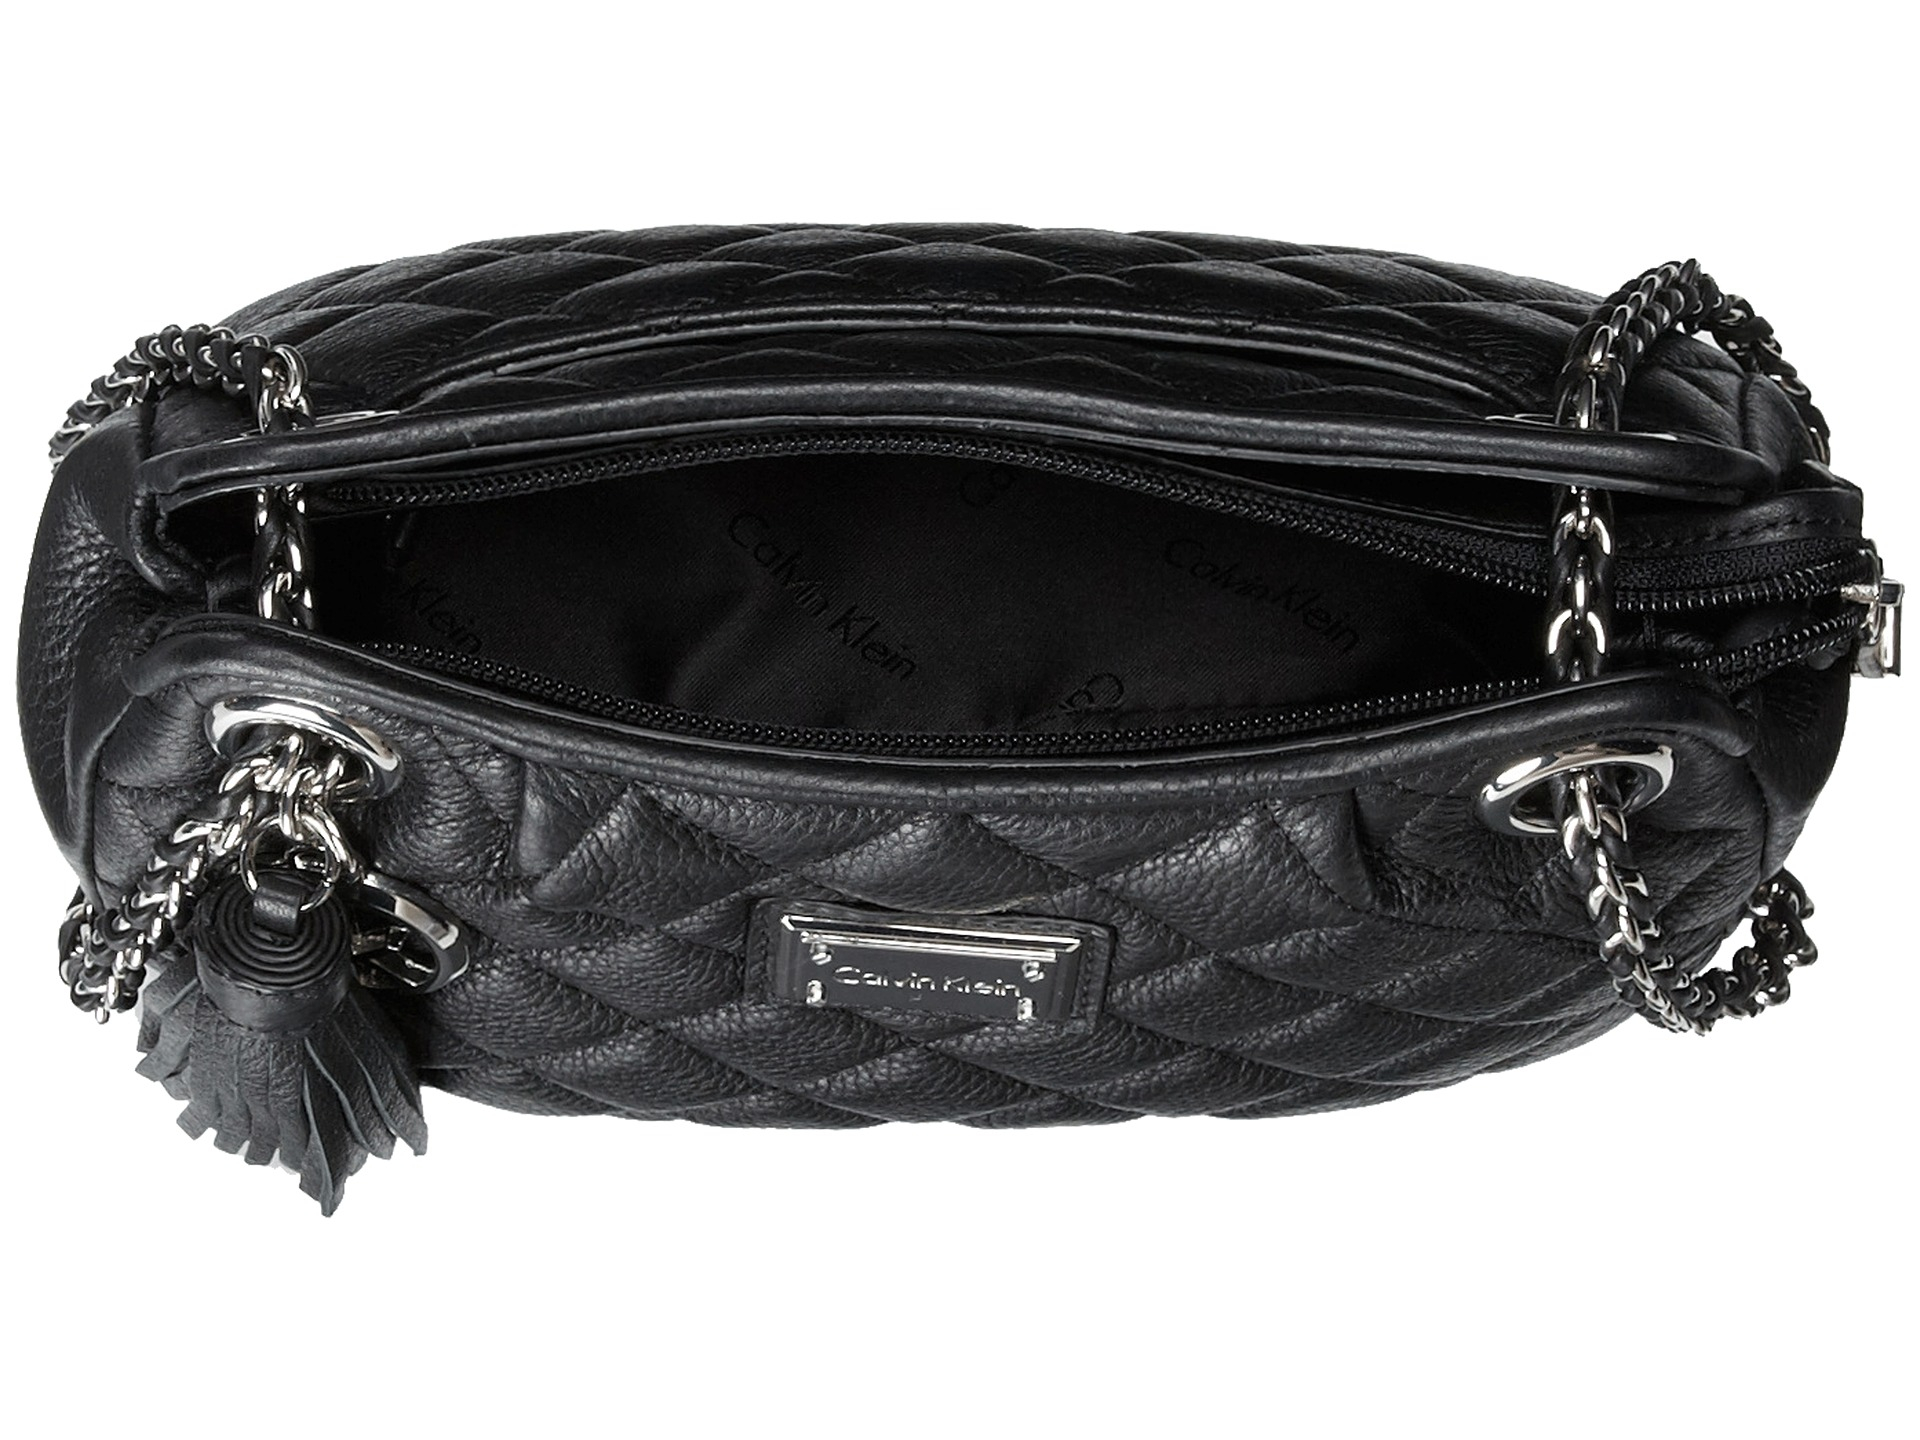 Lyst - Calvin klein Quilted Leather Tassel Crossbody in Black : calvin klein quilted leather crossbody bag - Adamdwight.com